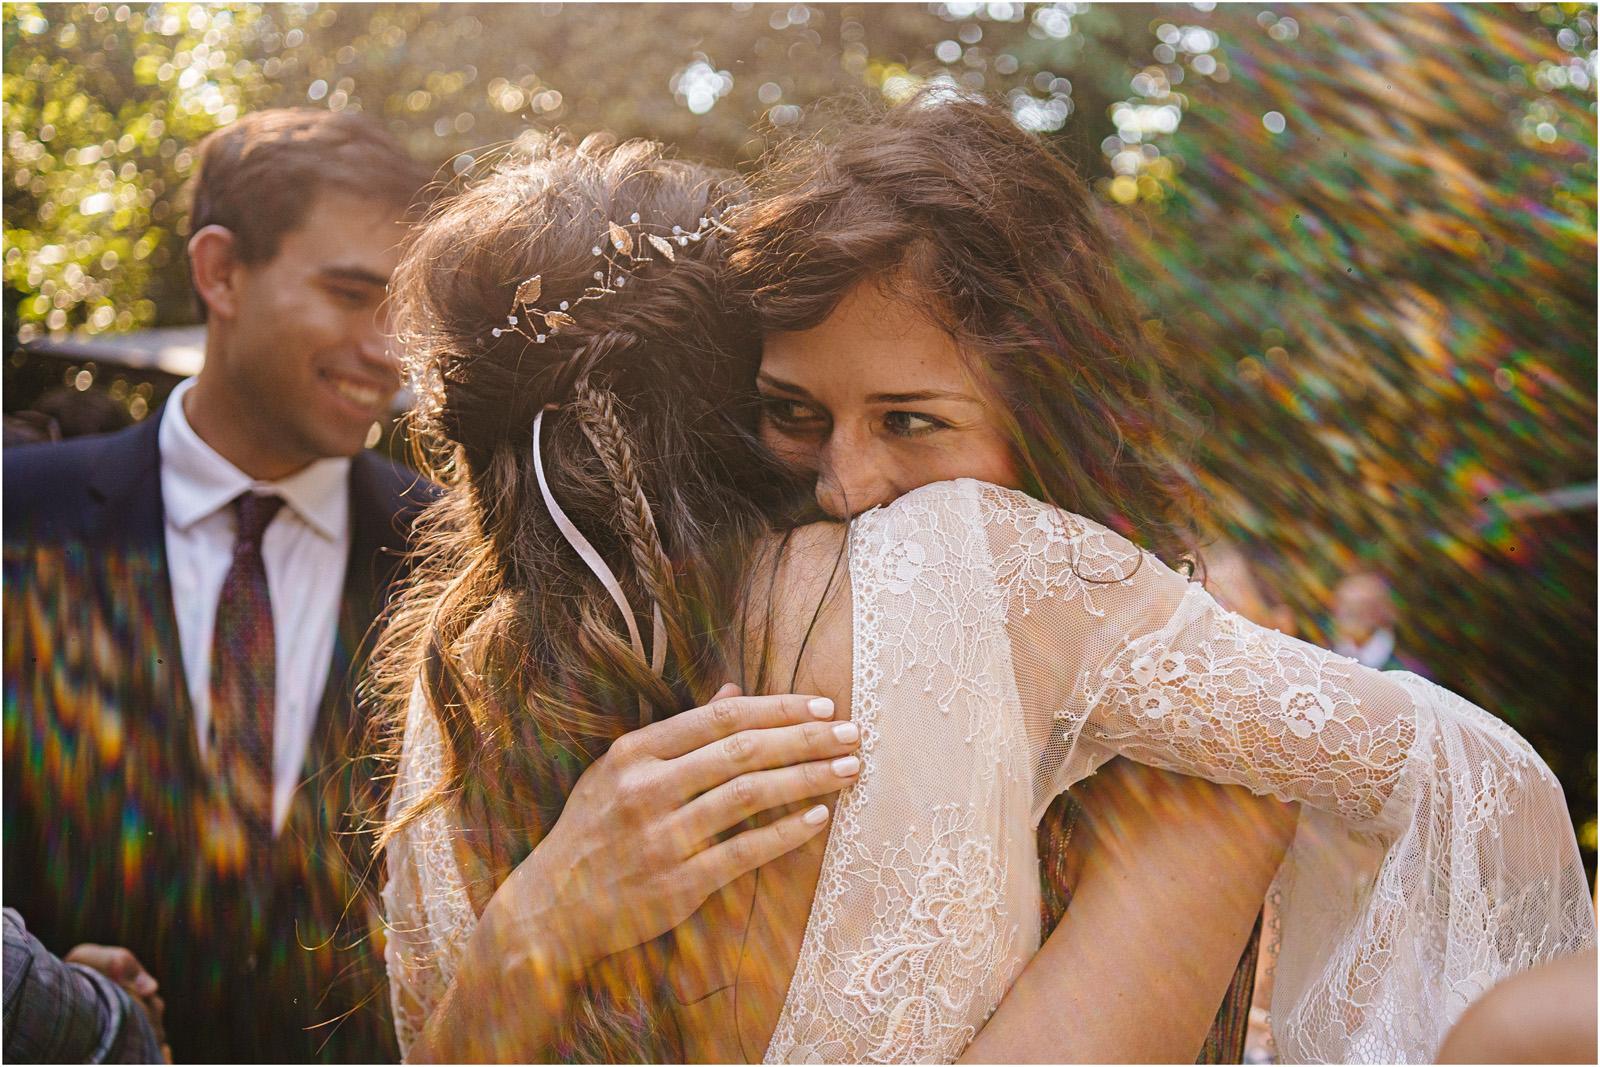 Ania & Mateusz | boho wesele w Stodole pod Kasztanami 77